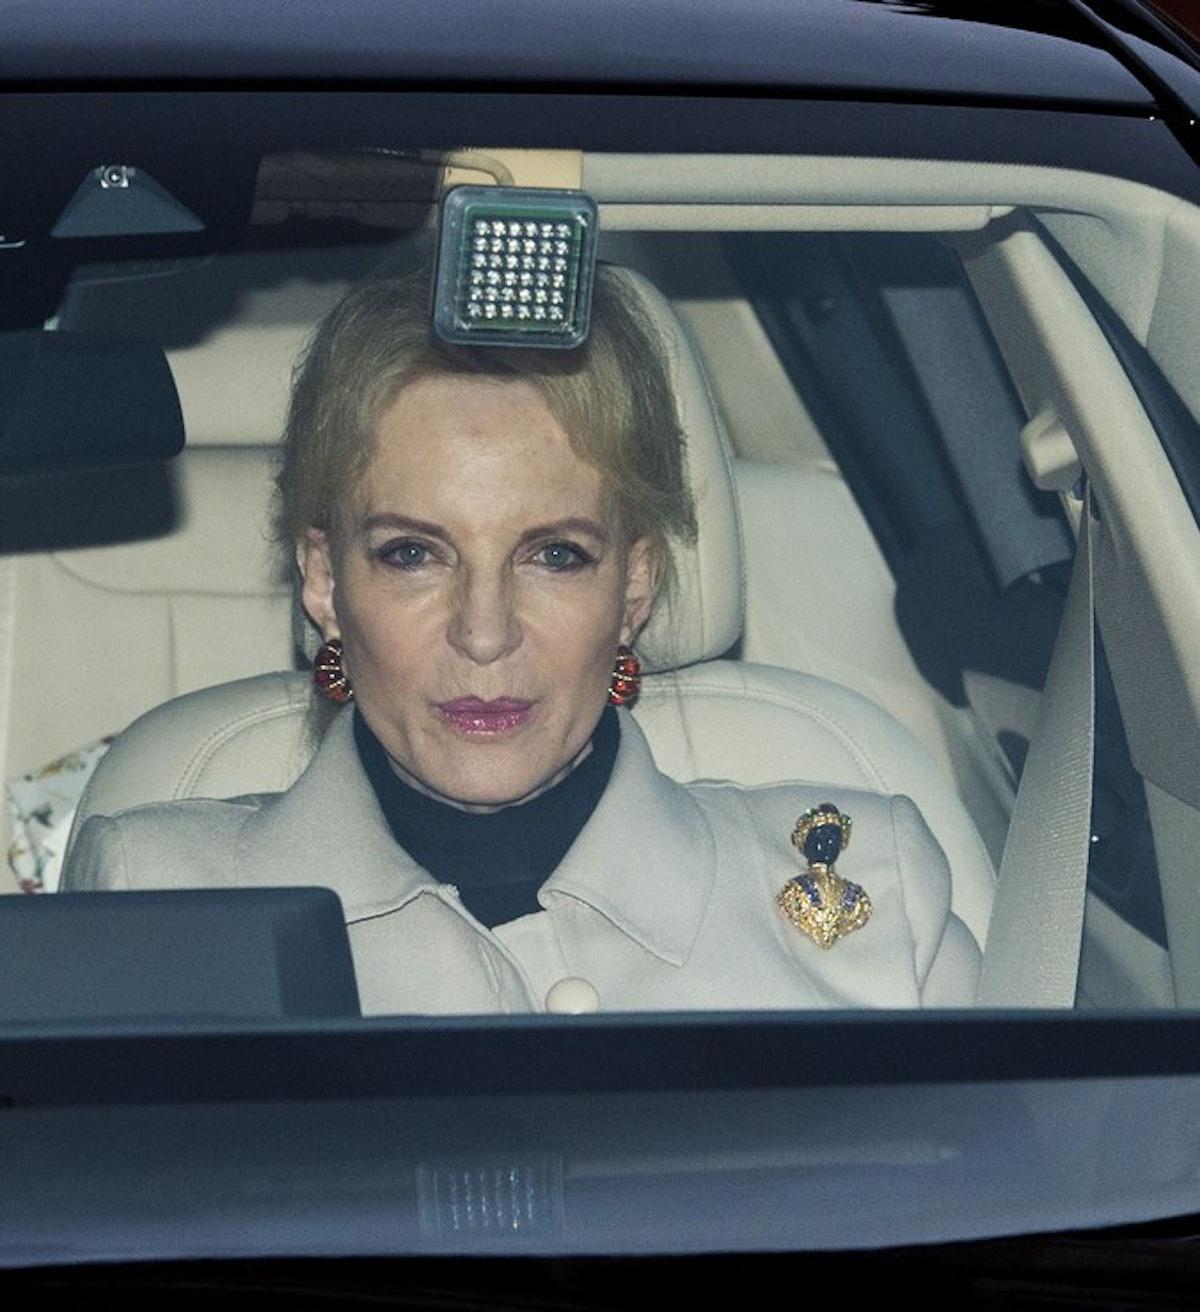 princess-michael-of-kent-wore-racist-brooch-to-lunch-meghan-markle-01.jpg